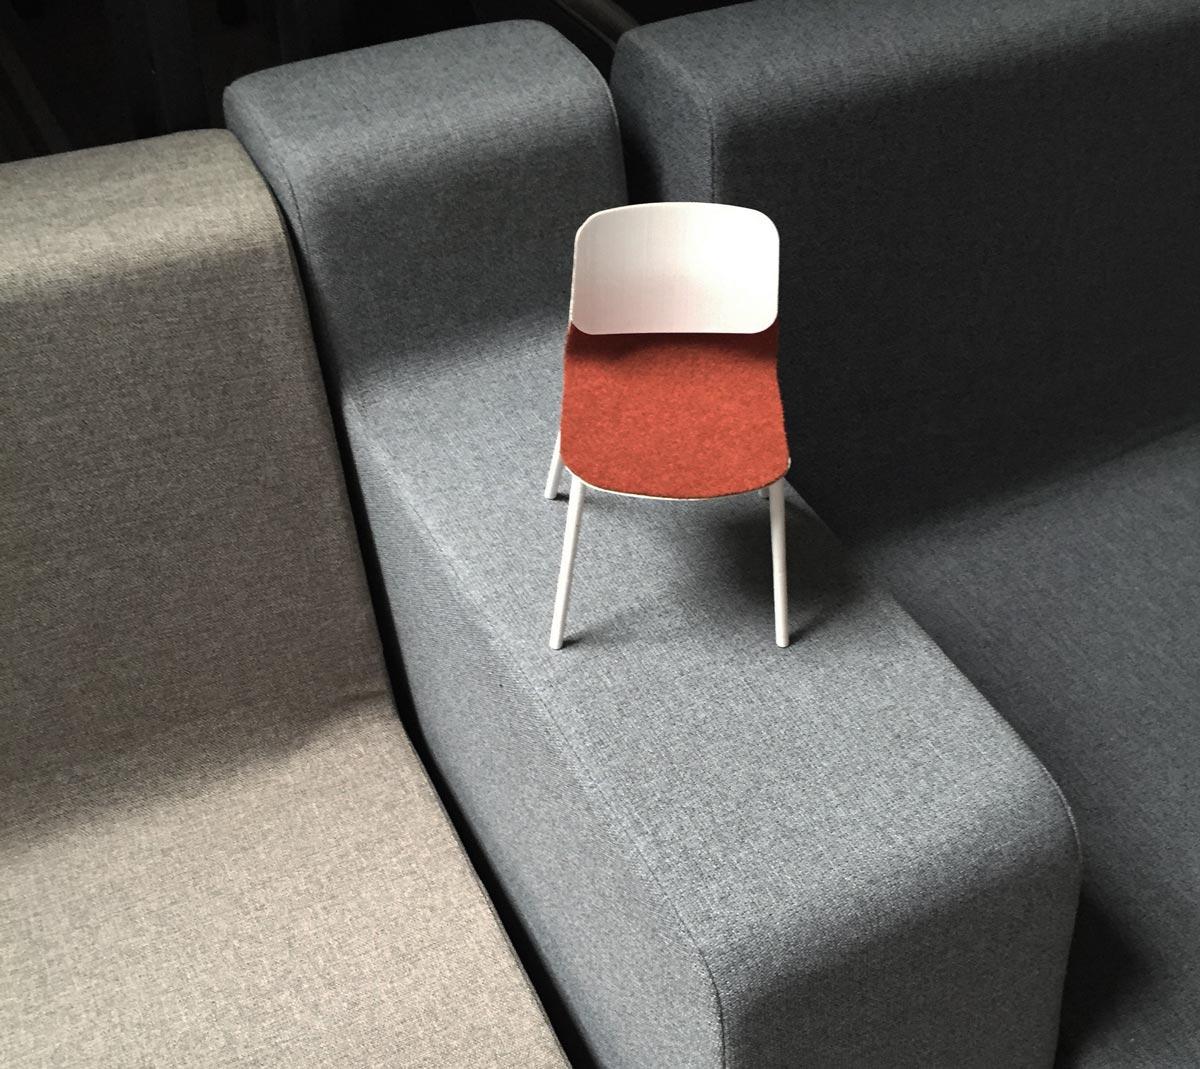 sokoa-klik-chair-scale-3d